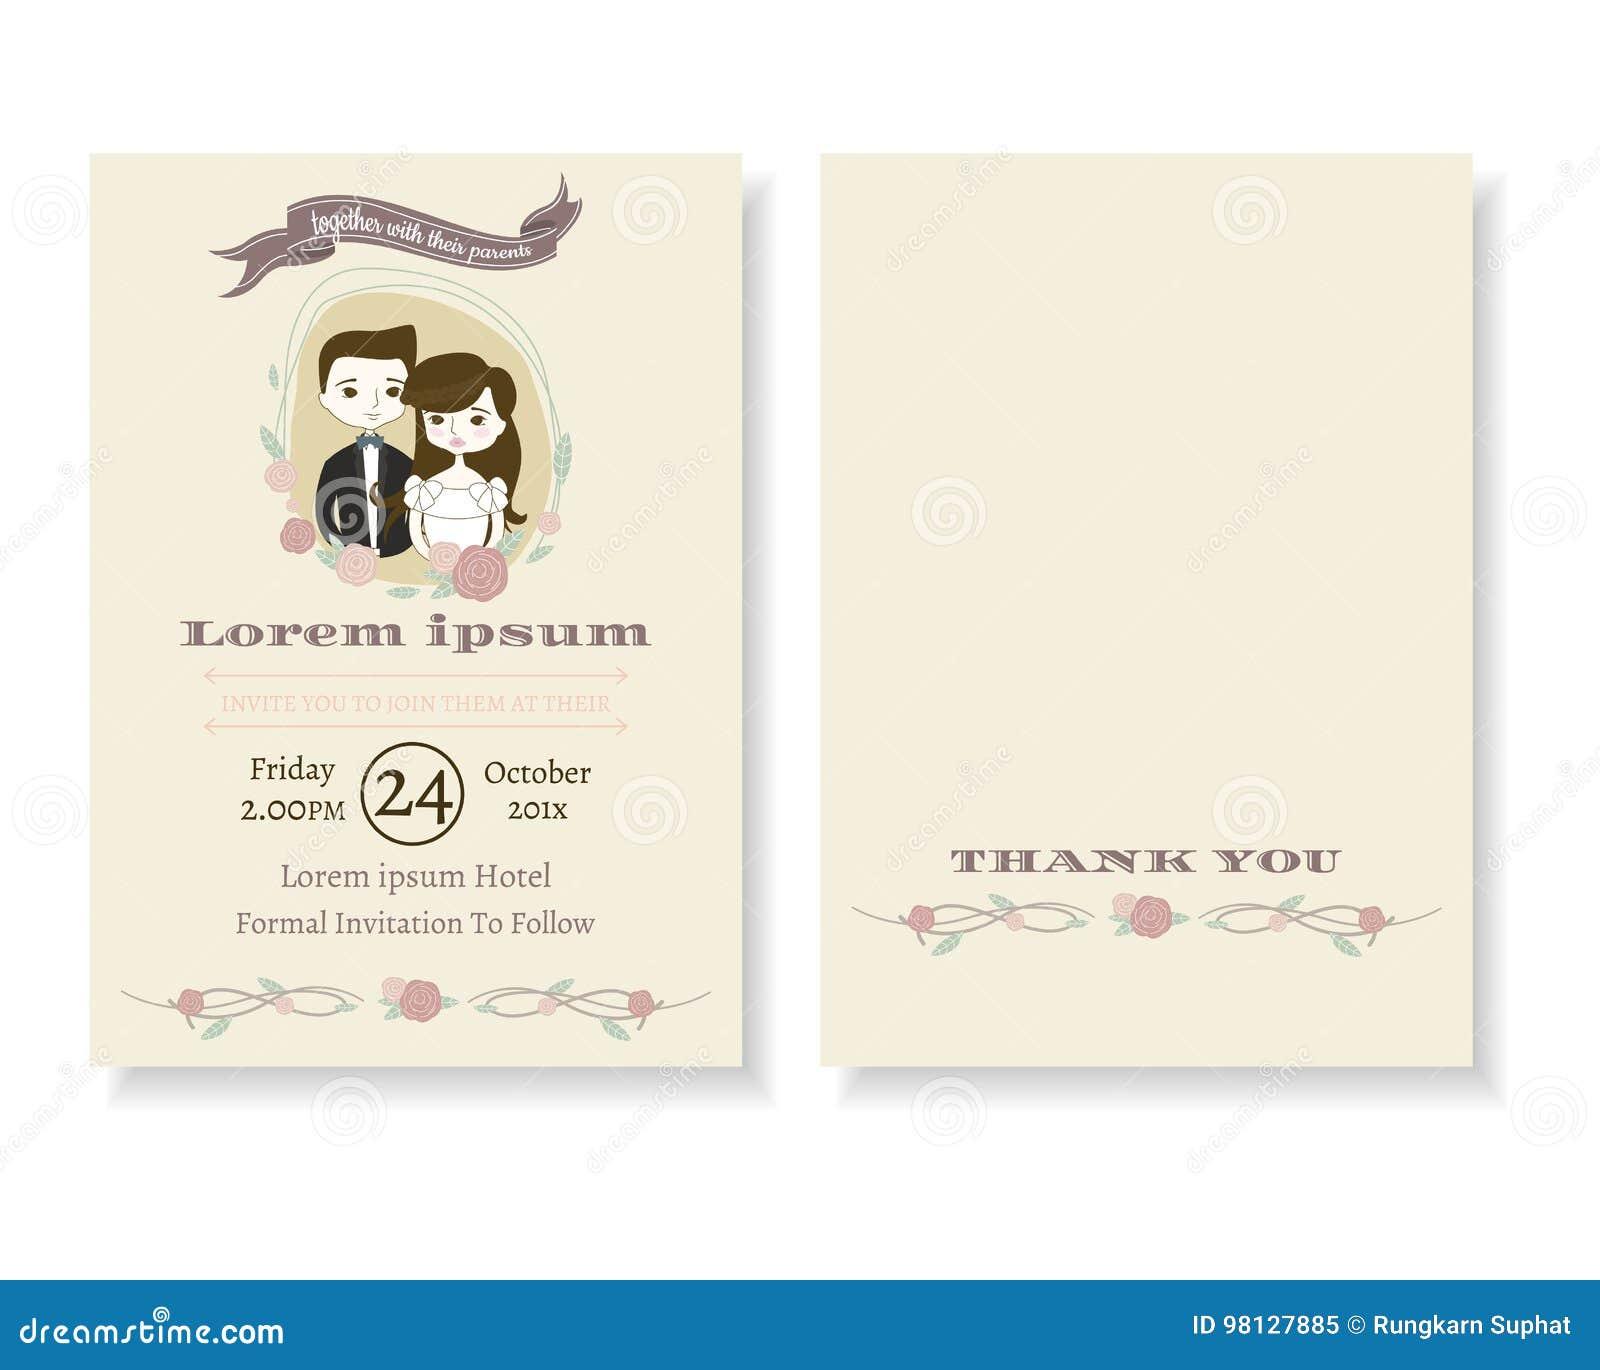 Set Of Cute Couple Cartoon Wedding Invitation Card. Modern Doodle